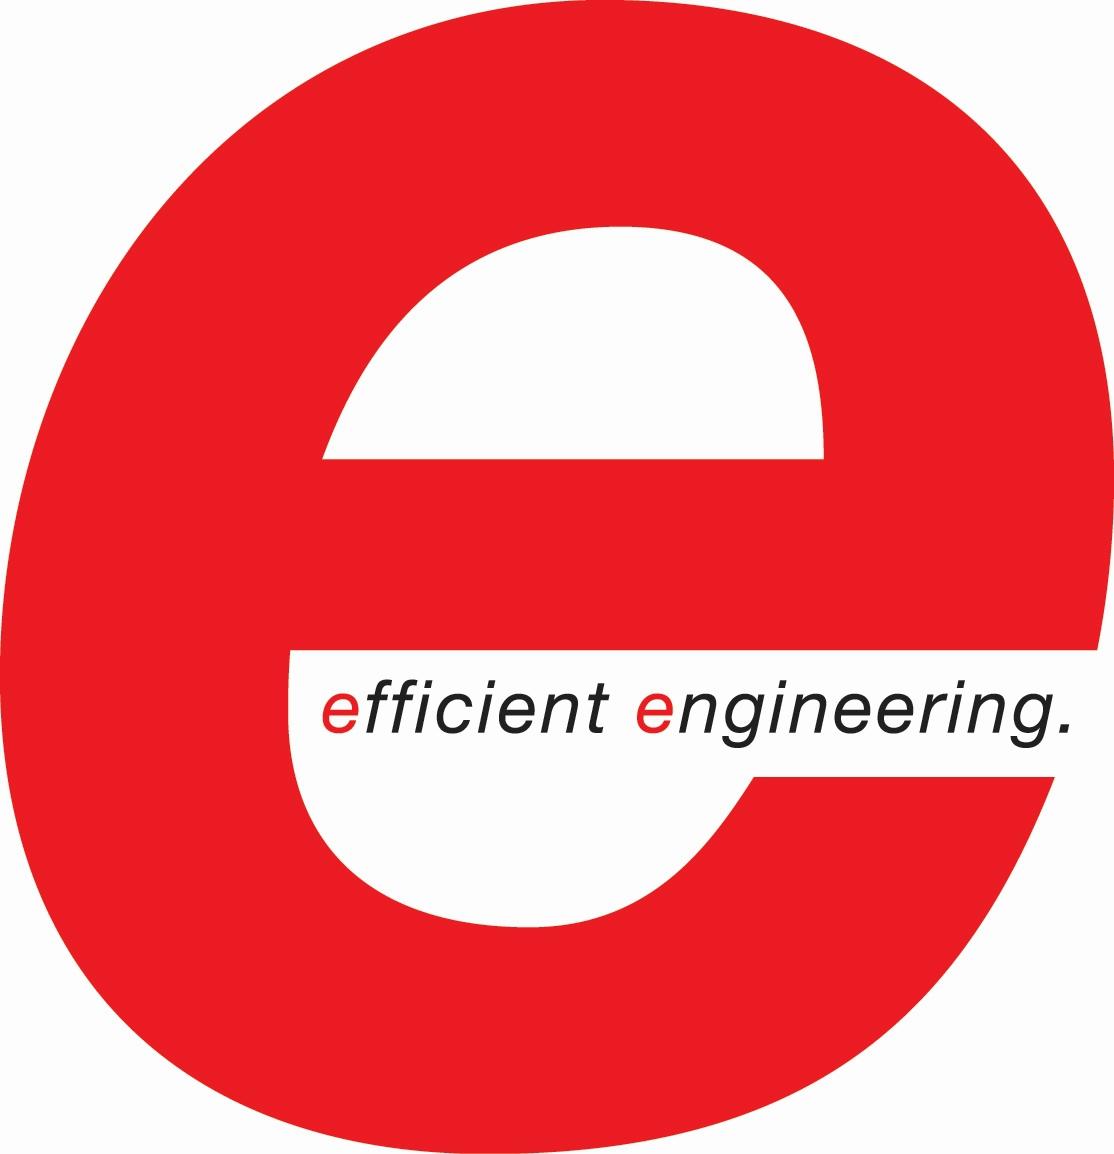 e efficient engineering